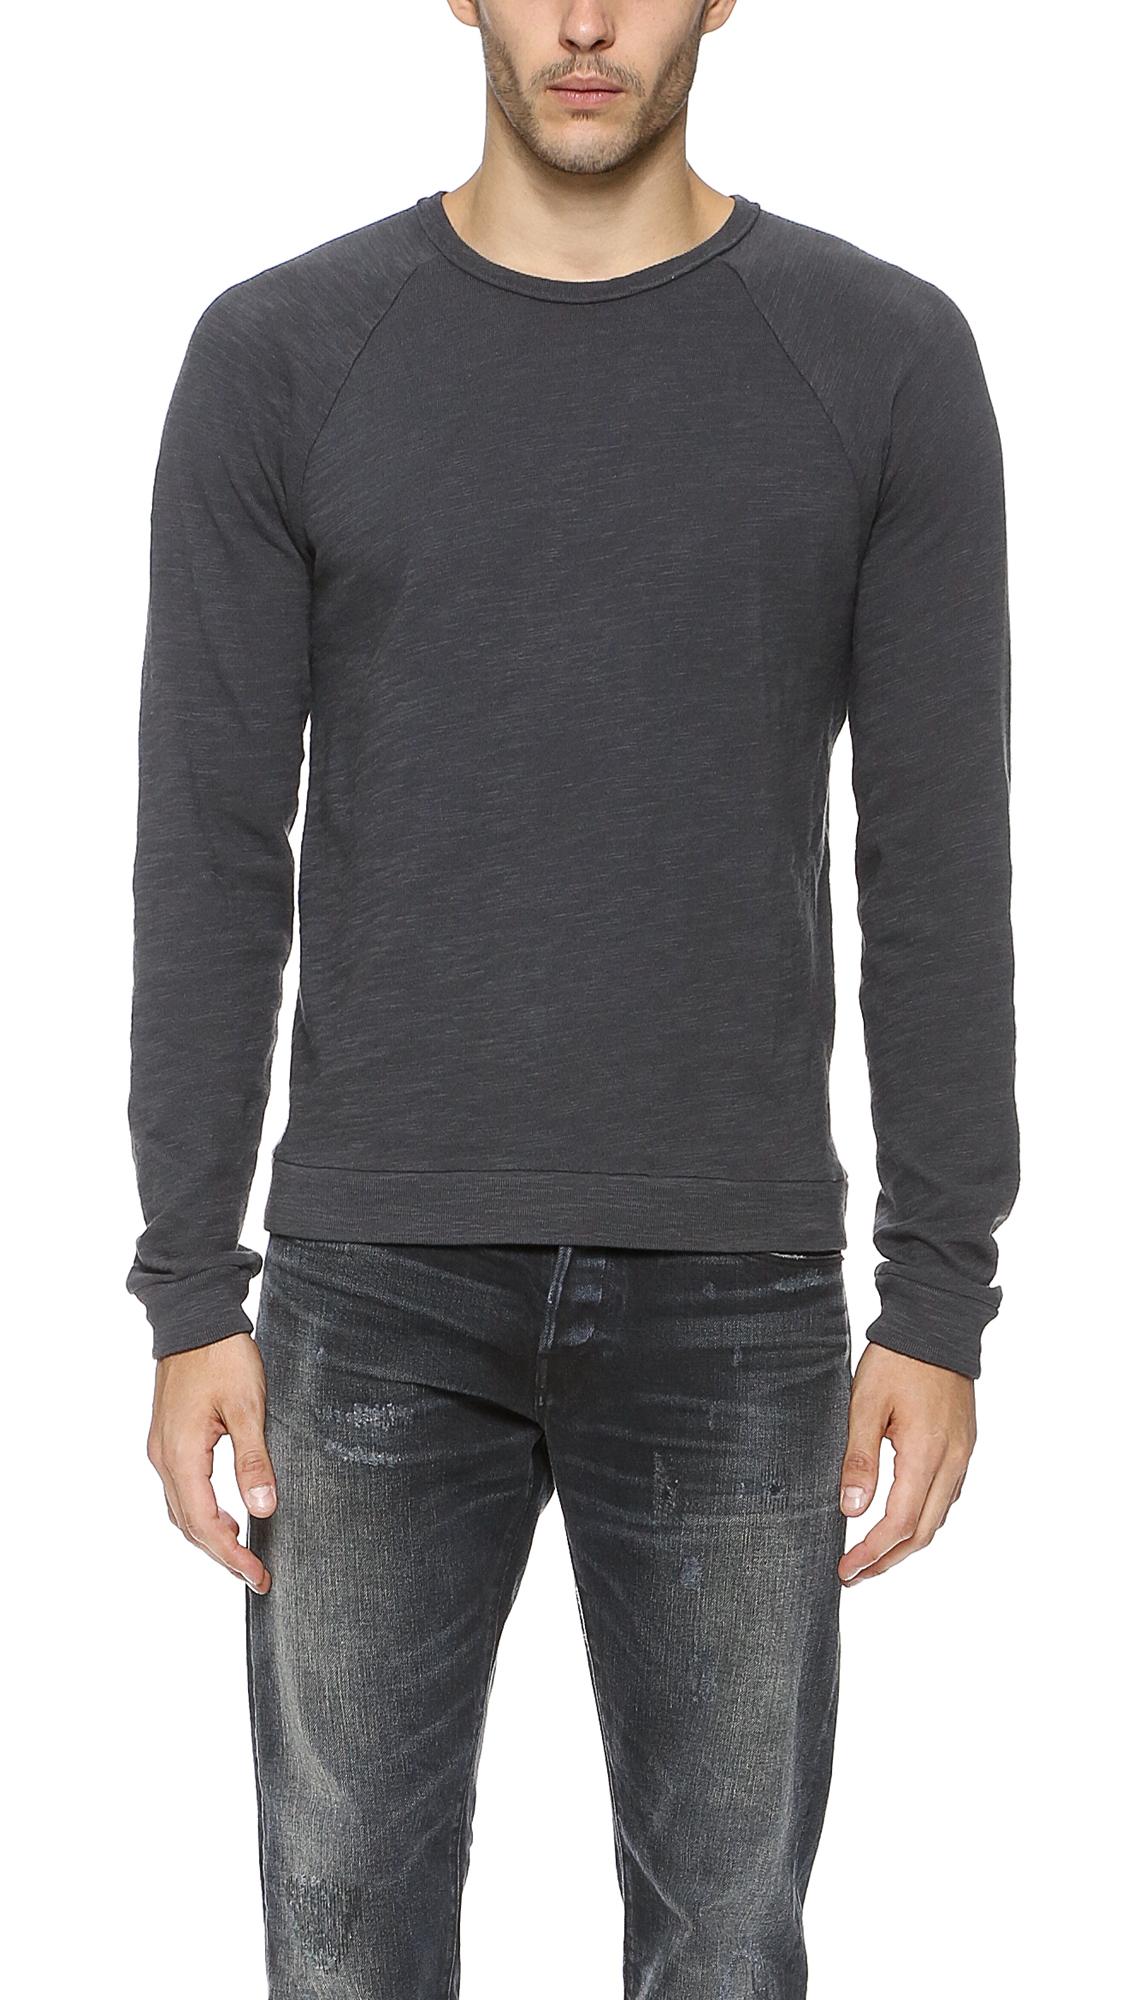 Rag bone long sleeve raglan t shirt in black for men lyst for Rag and bone mens shirts sale